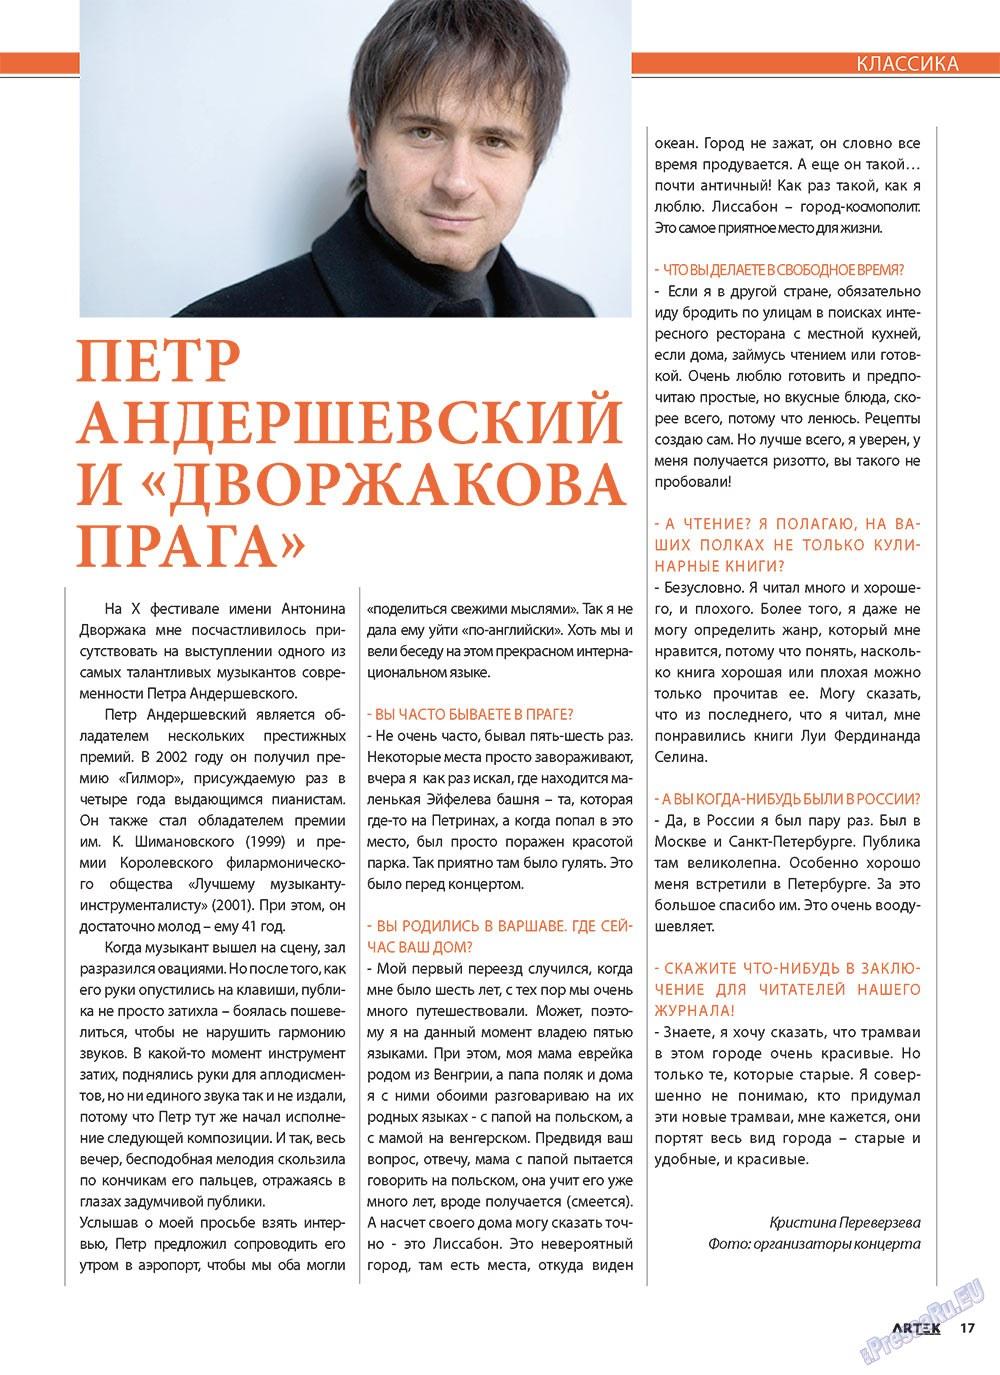 Артек (журнал). 2010 год, номер 6, стр. 19